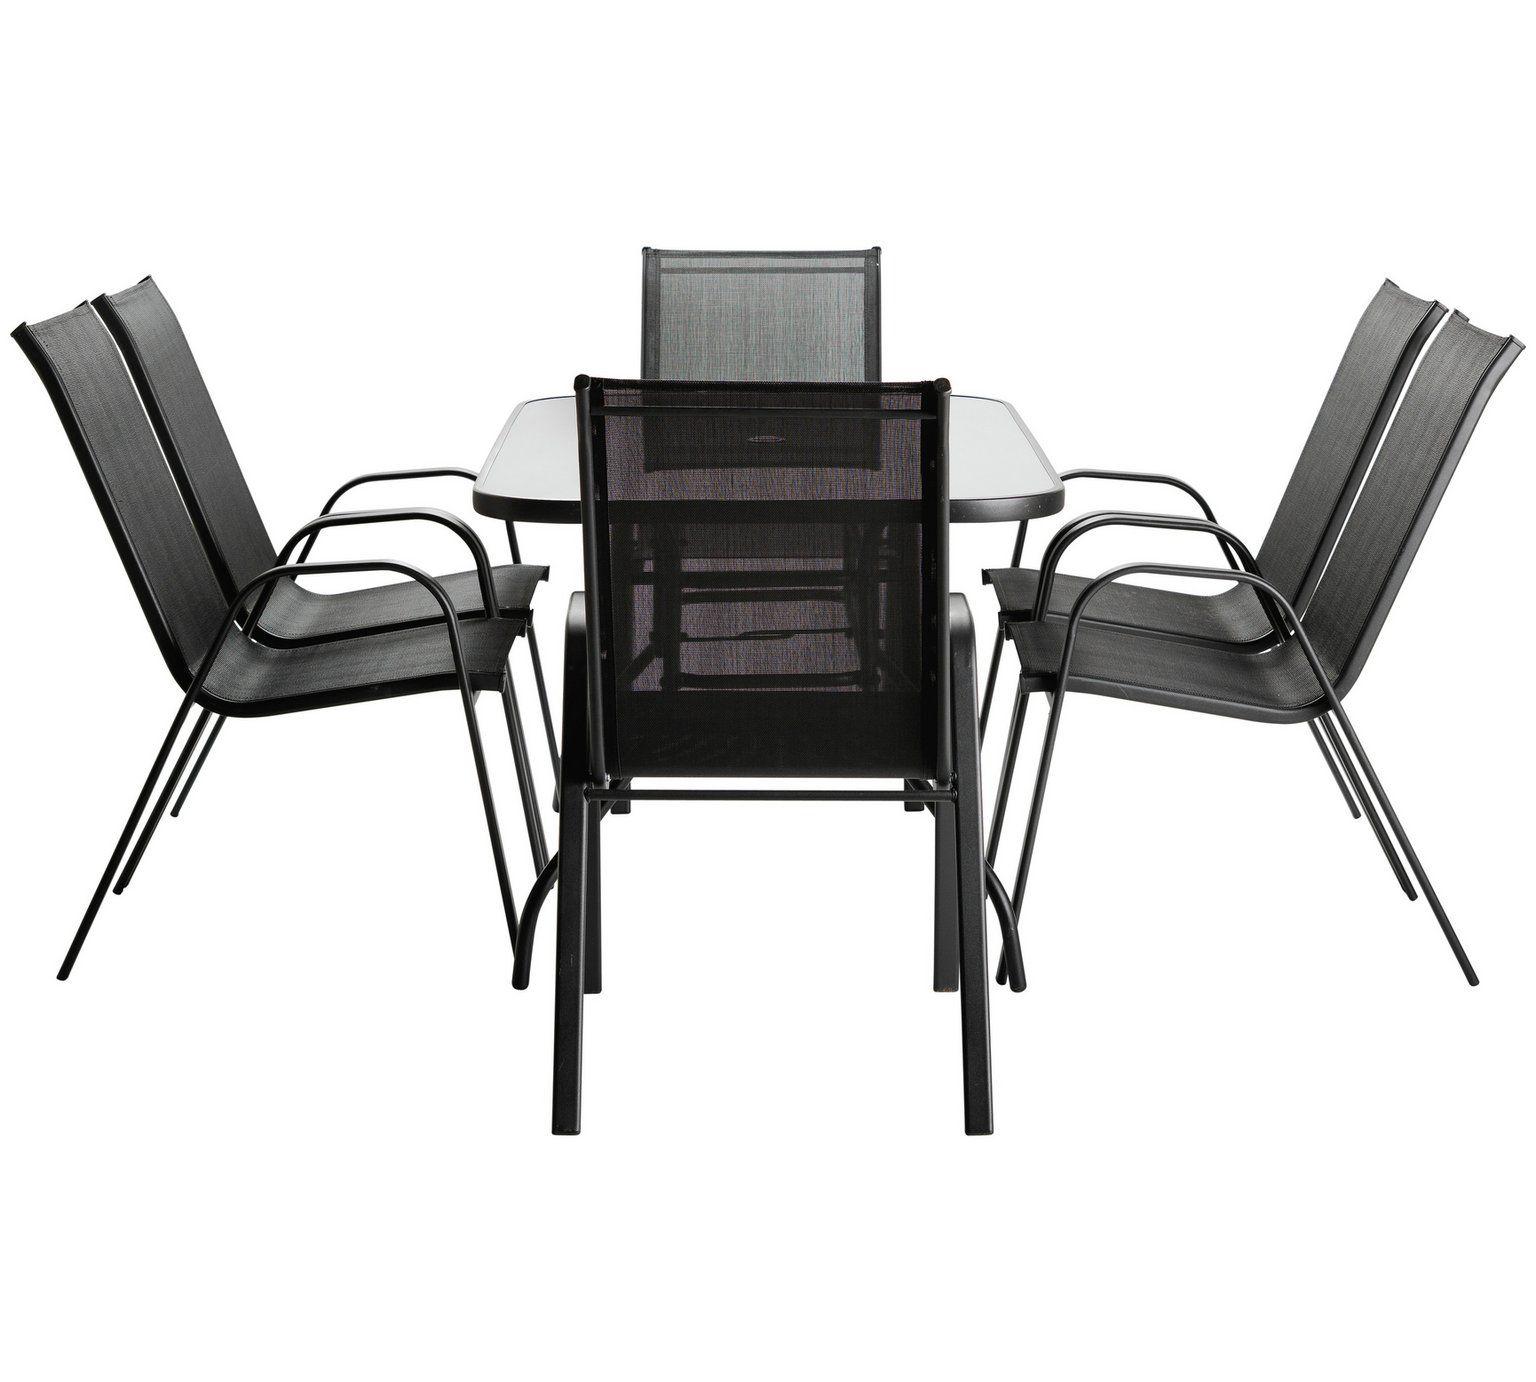 Buy HOME Sicily 6 Seater Patio Furniture Set at Argos.co.uk, visit ...